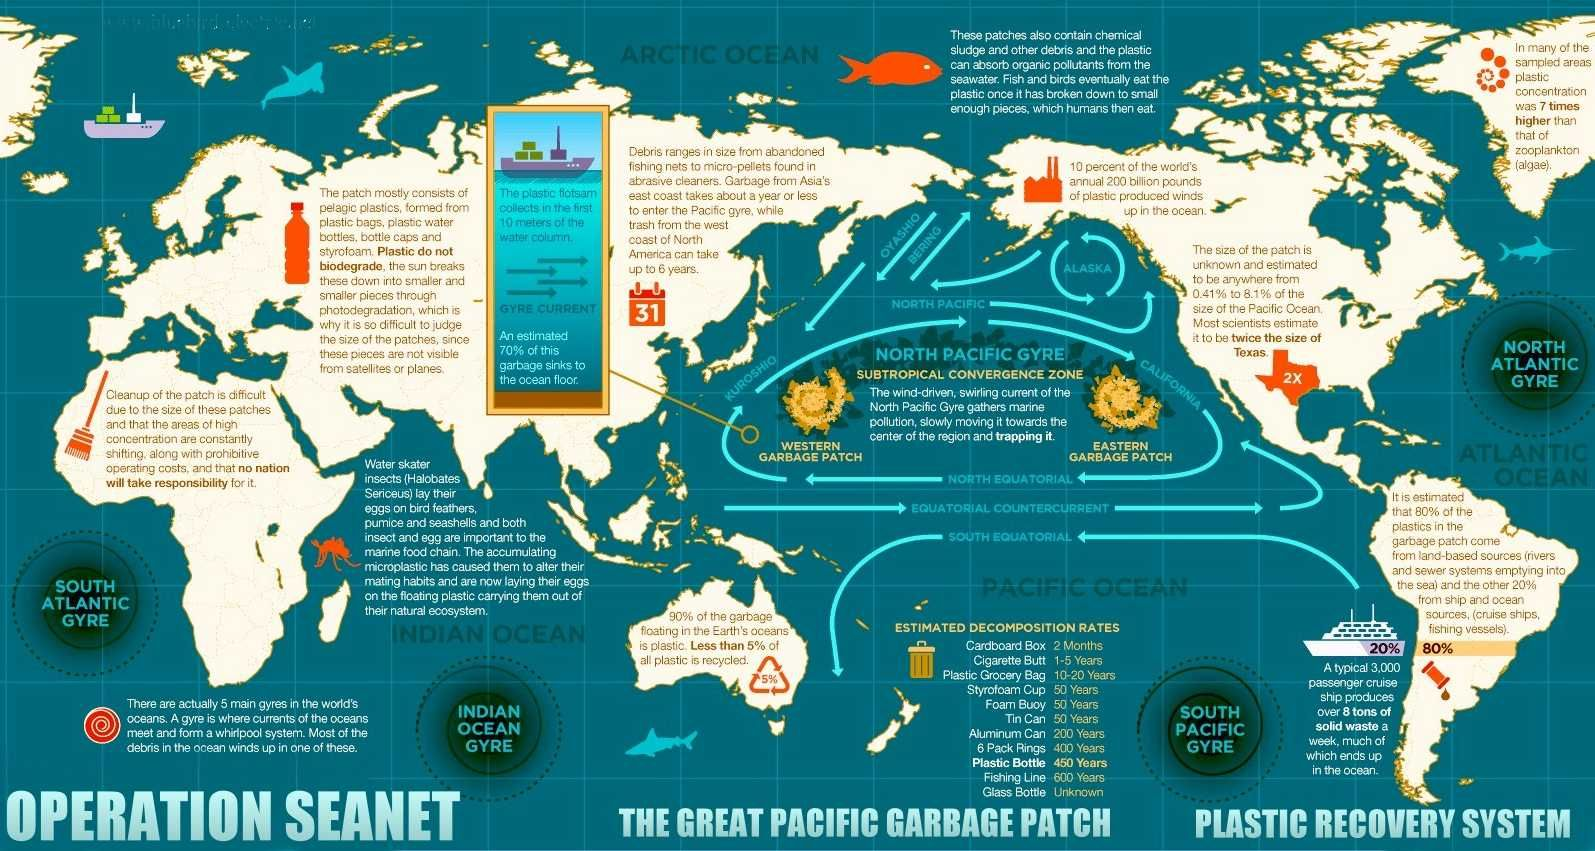 Plasticoceansgreatpacificgarbagepatchworldmap